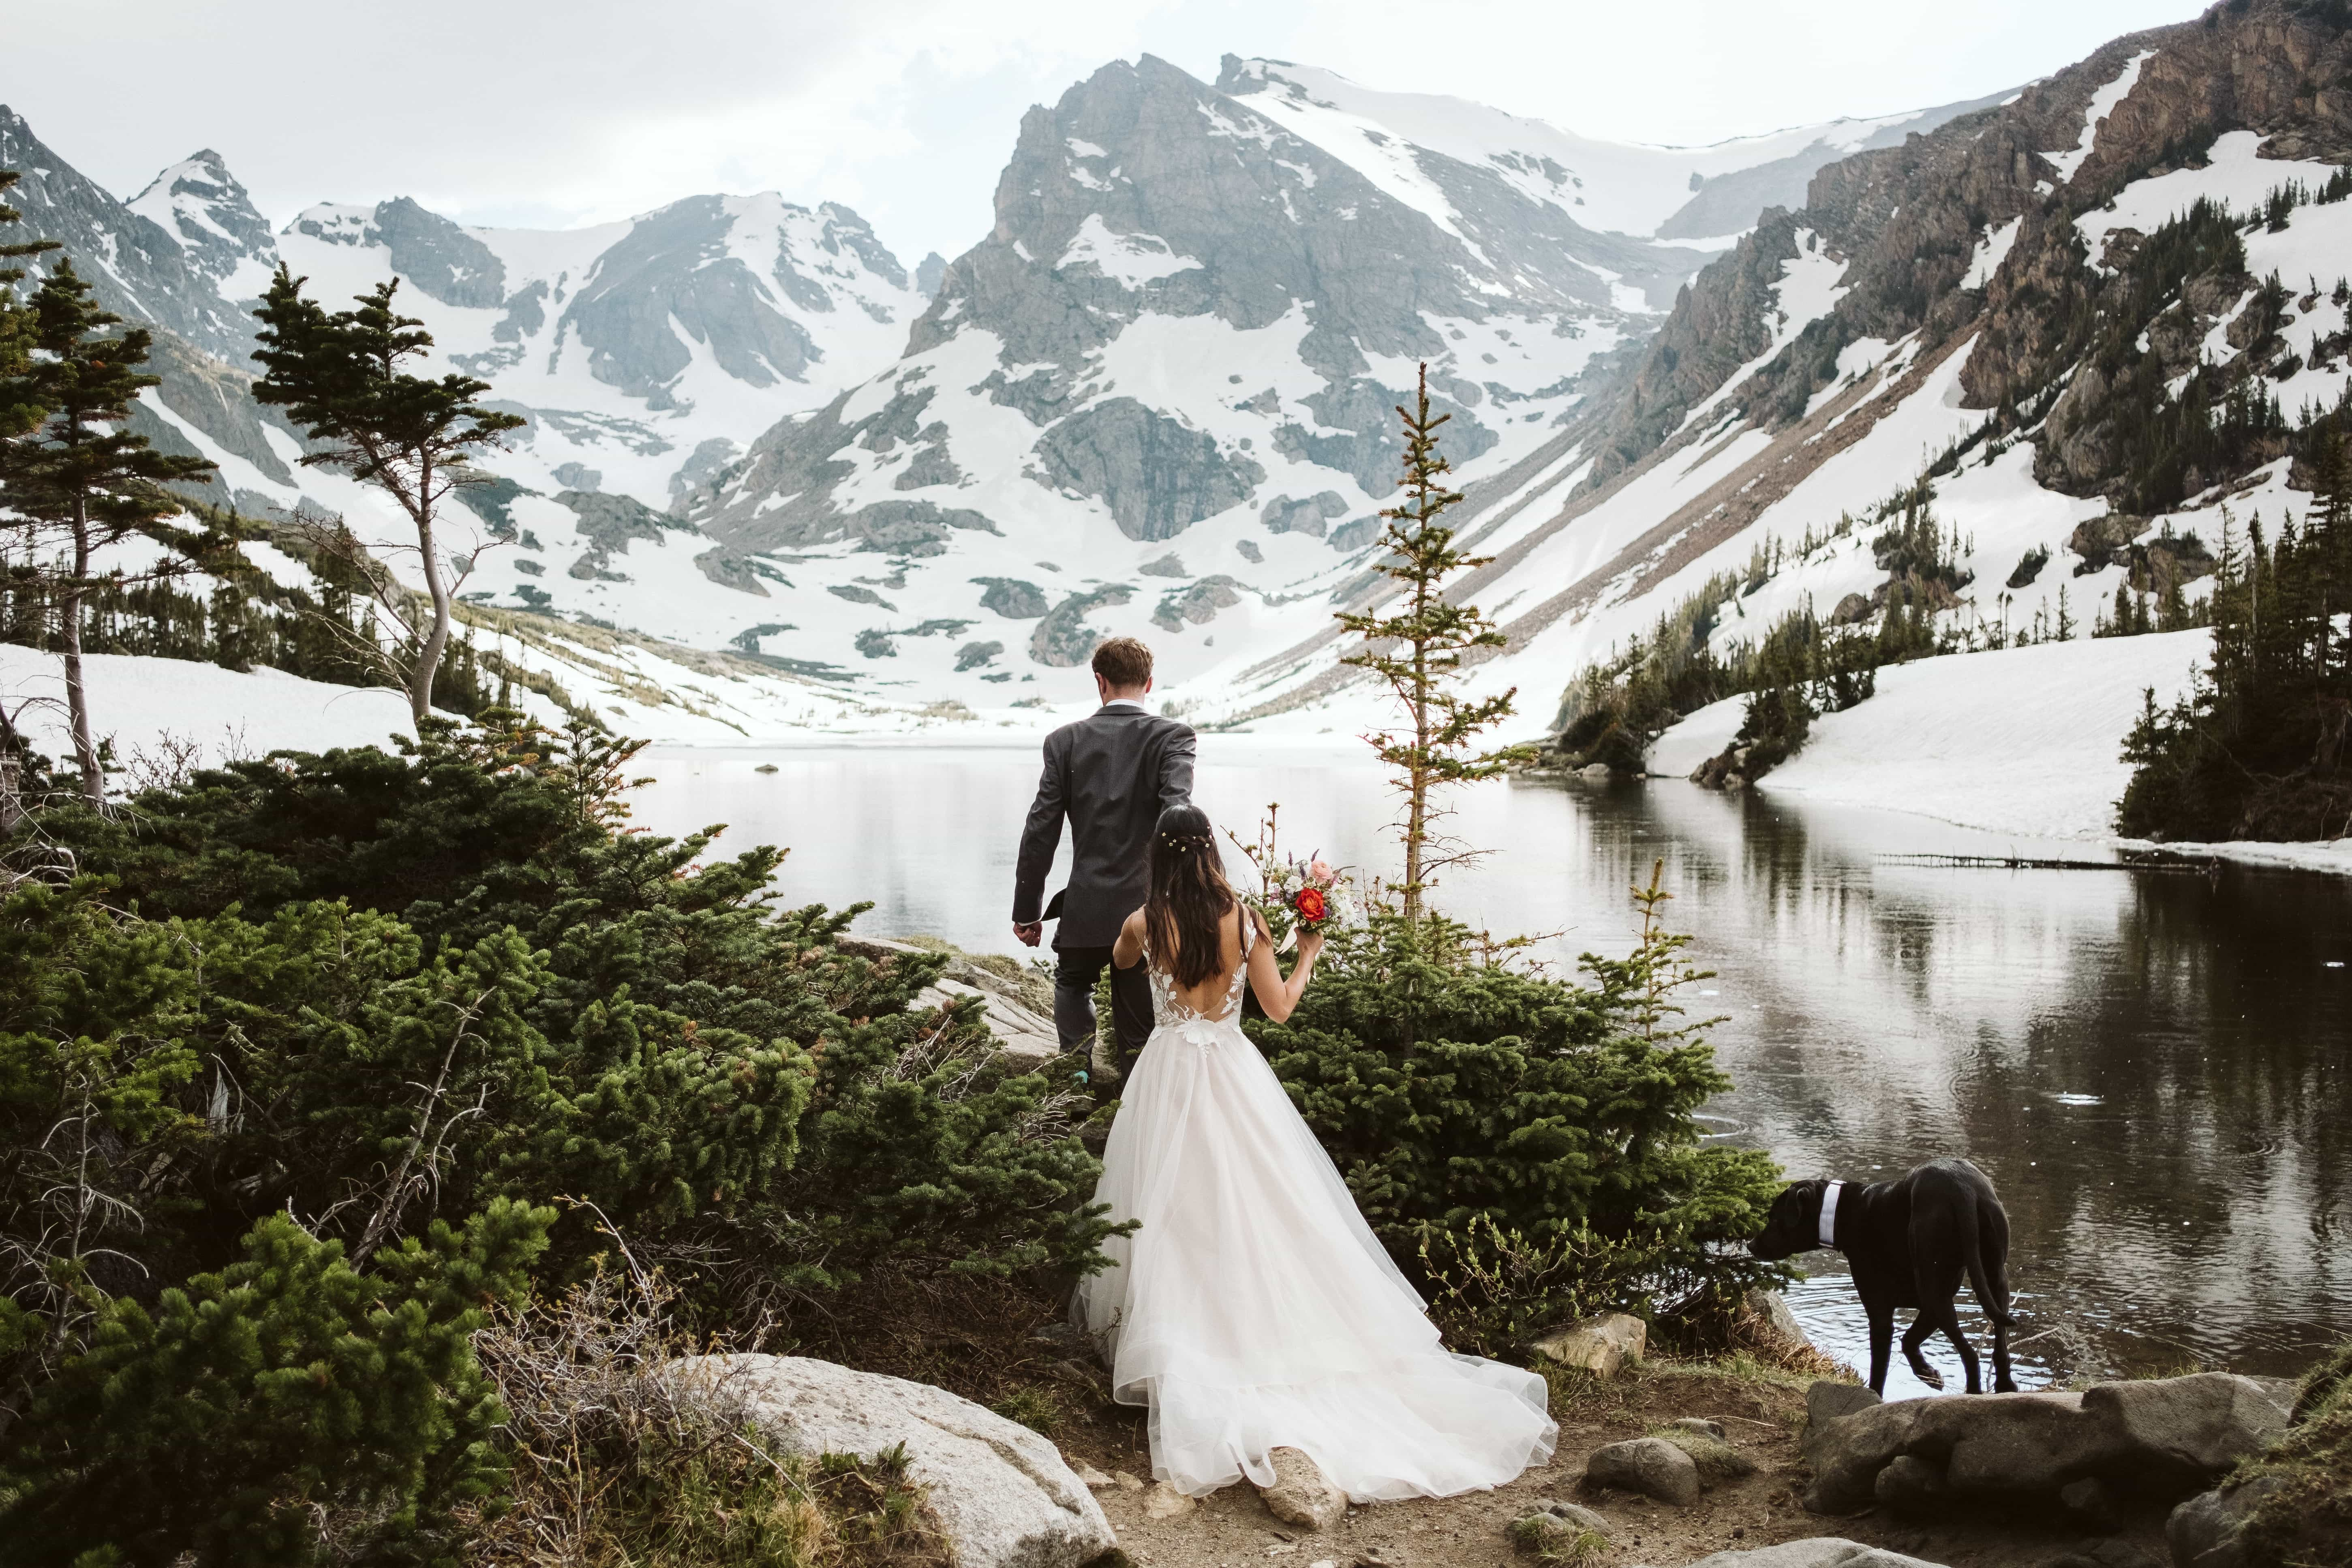 Colorado hiking adventure elopement to alpine lake in Indian Peaks Wilderness